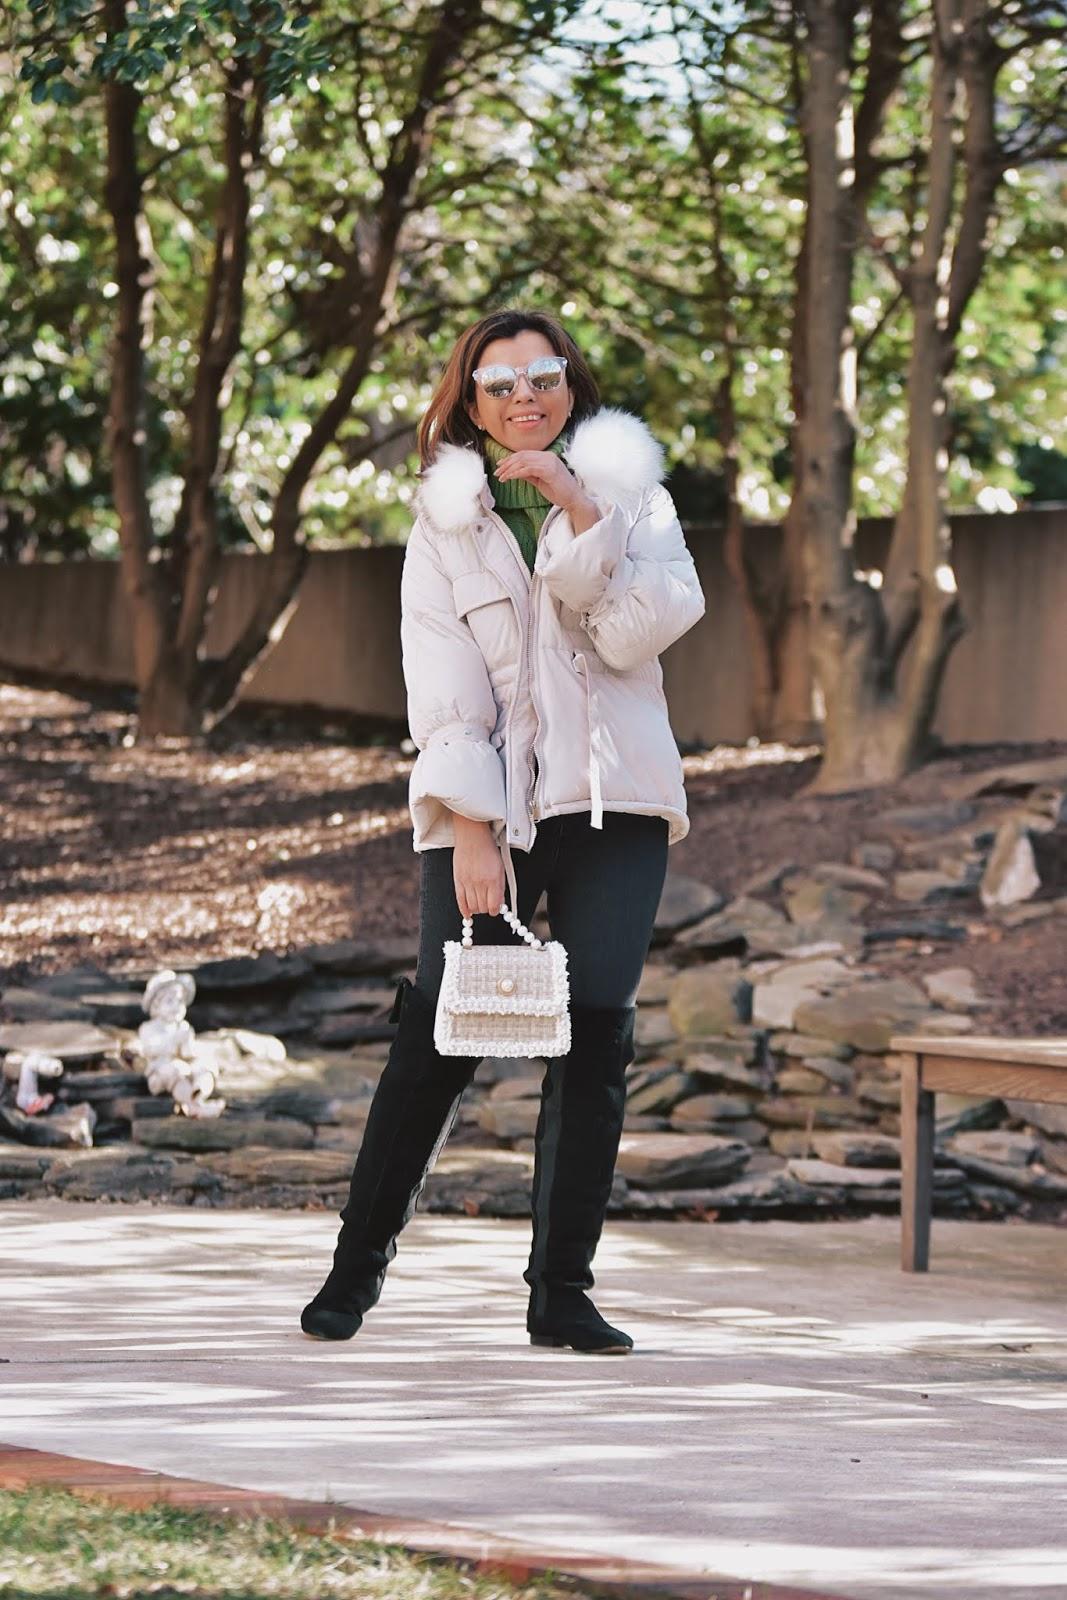 Winter Girly Outfit by Mari Estilo-winterstyle-sheingals-dcblogger-canaldemariestilo-moda-bolsos vintage-botas altas-ootd-